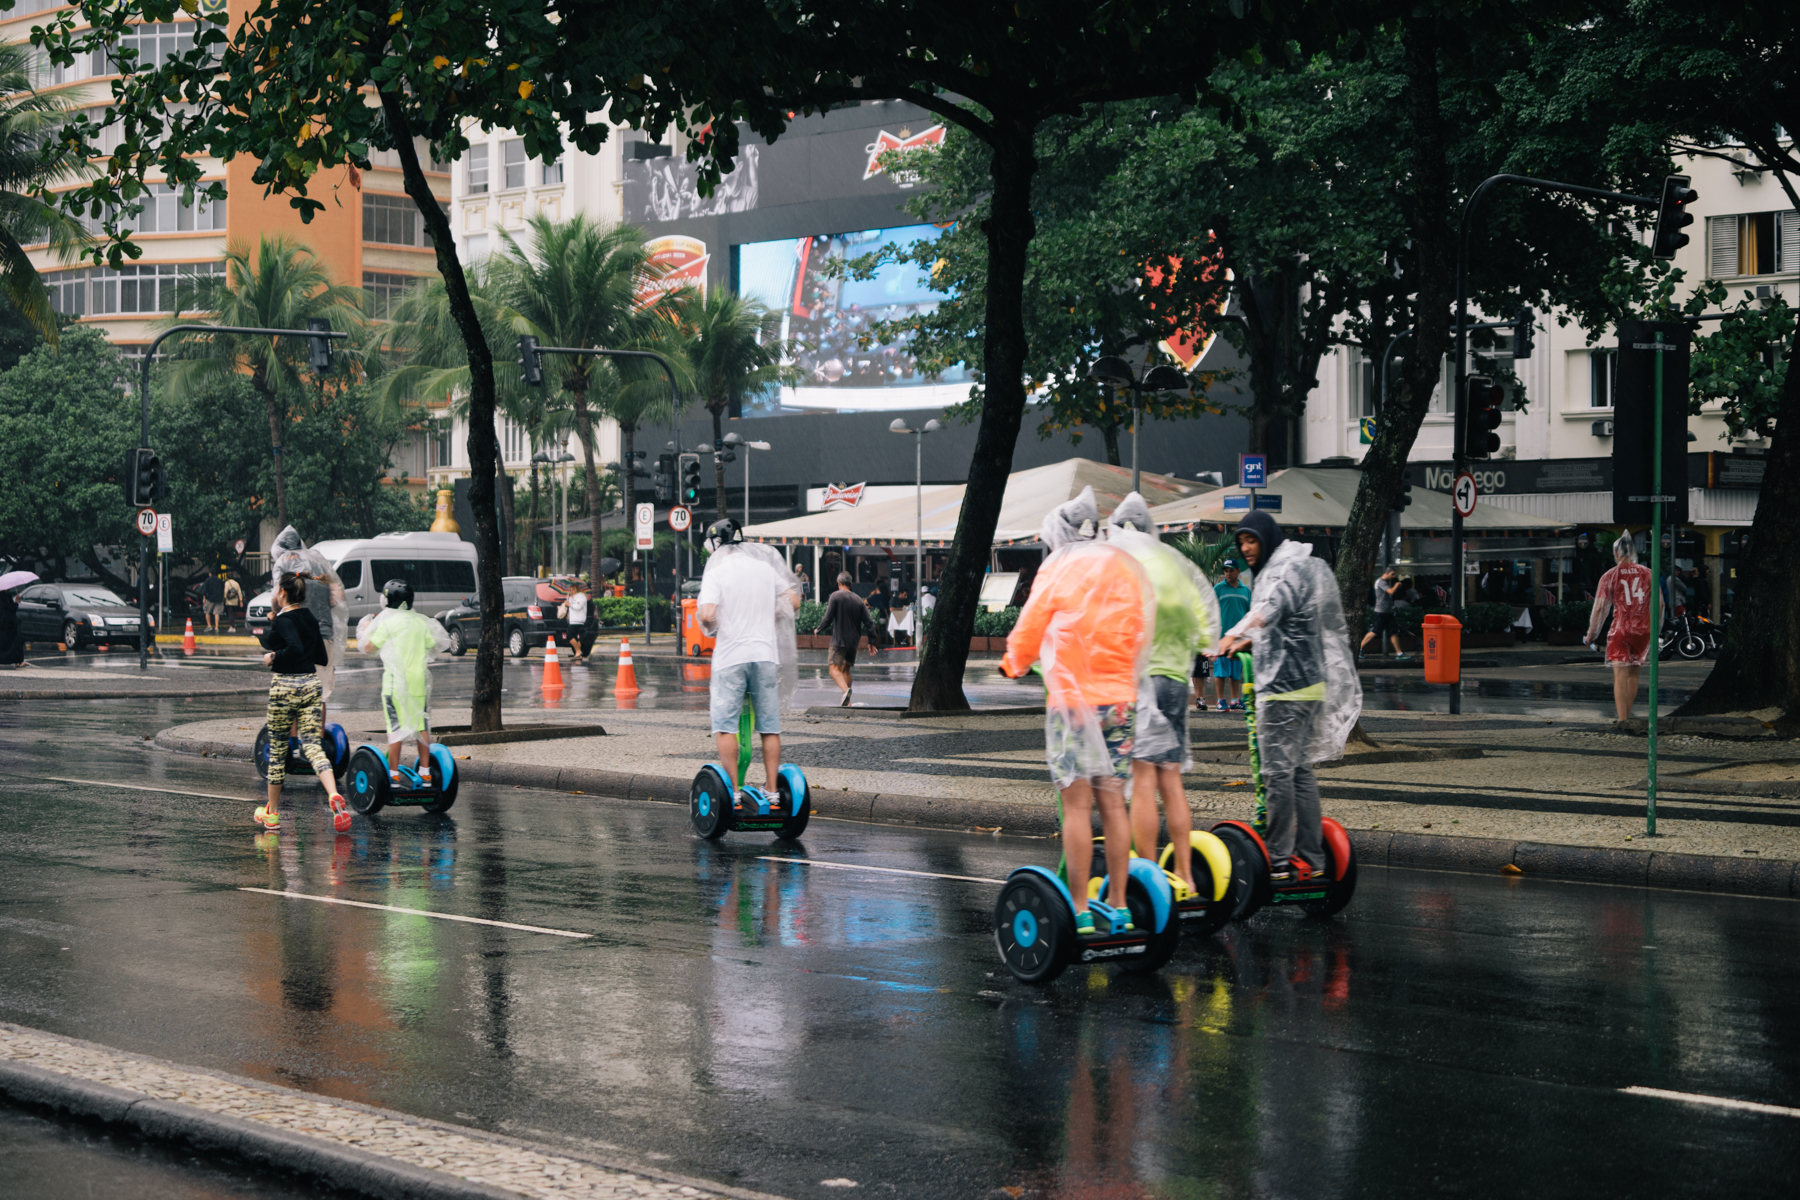 brazil-brasil-world-cup-olympics-rio-de-ride-bikes-copacabana-1